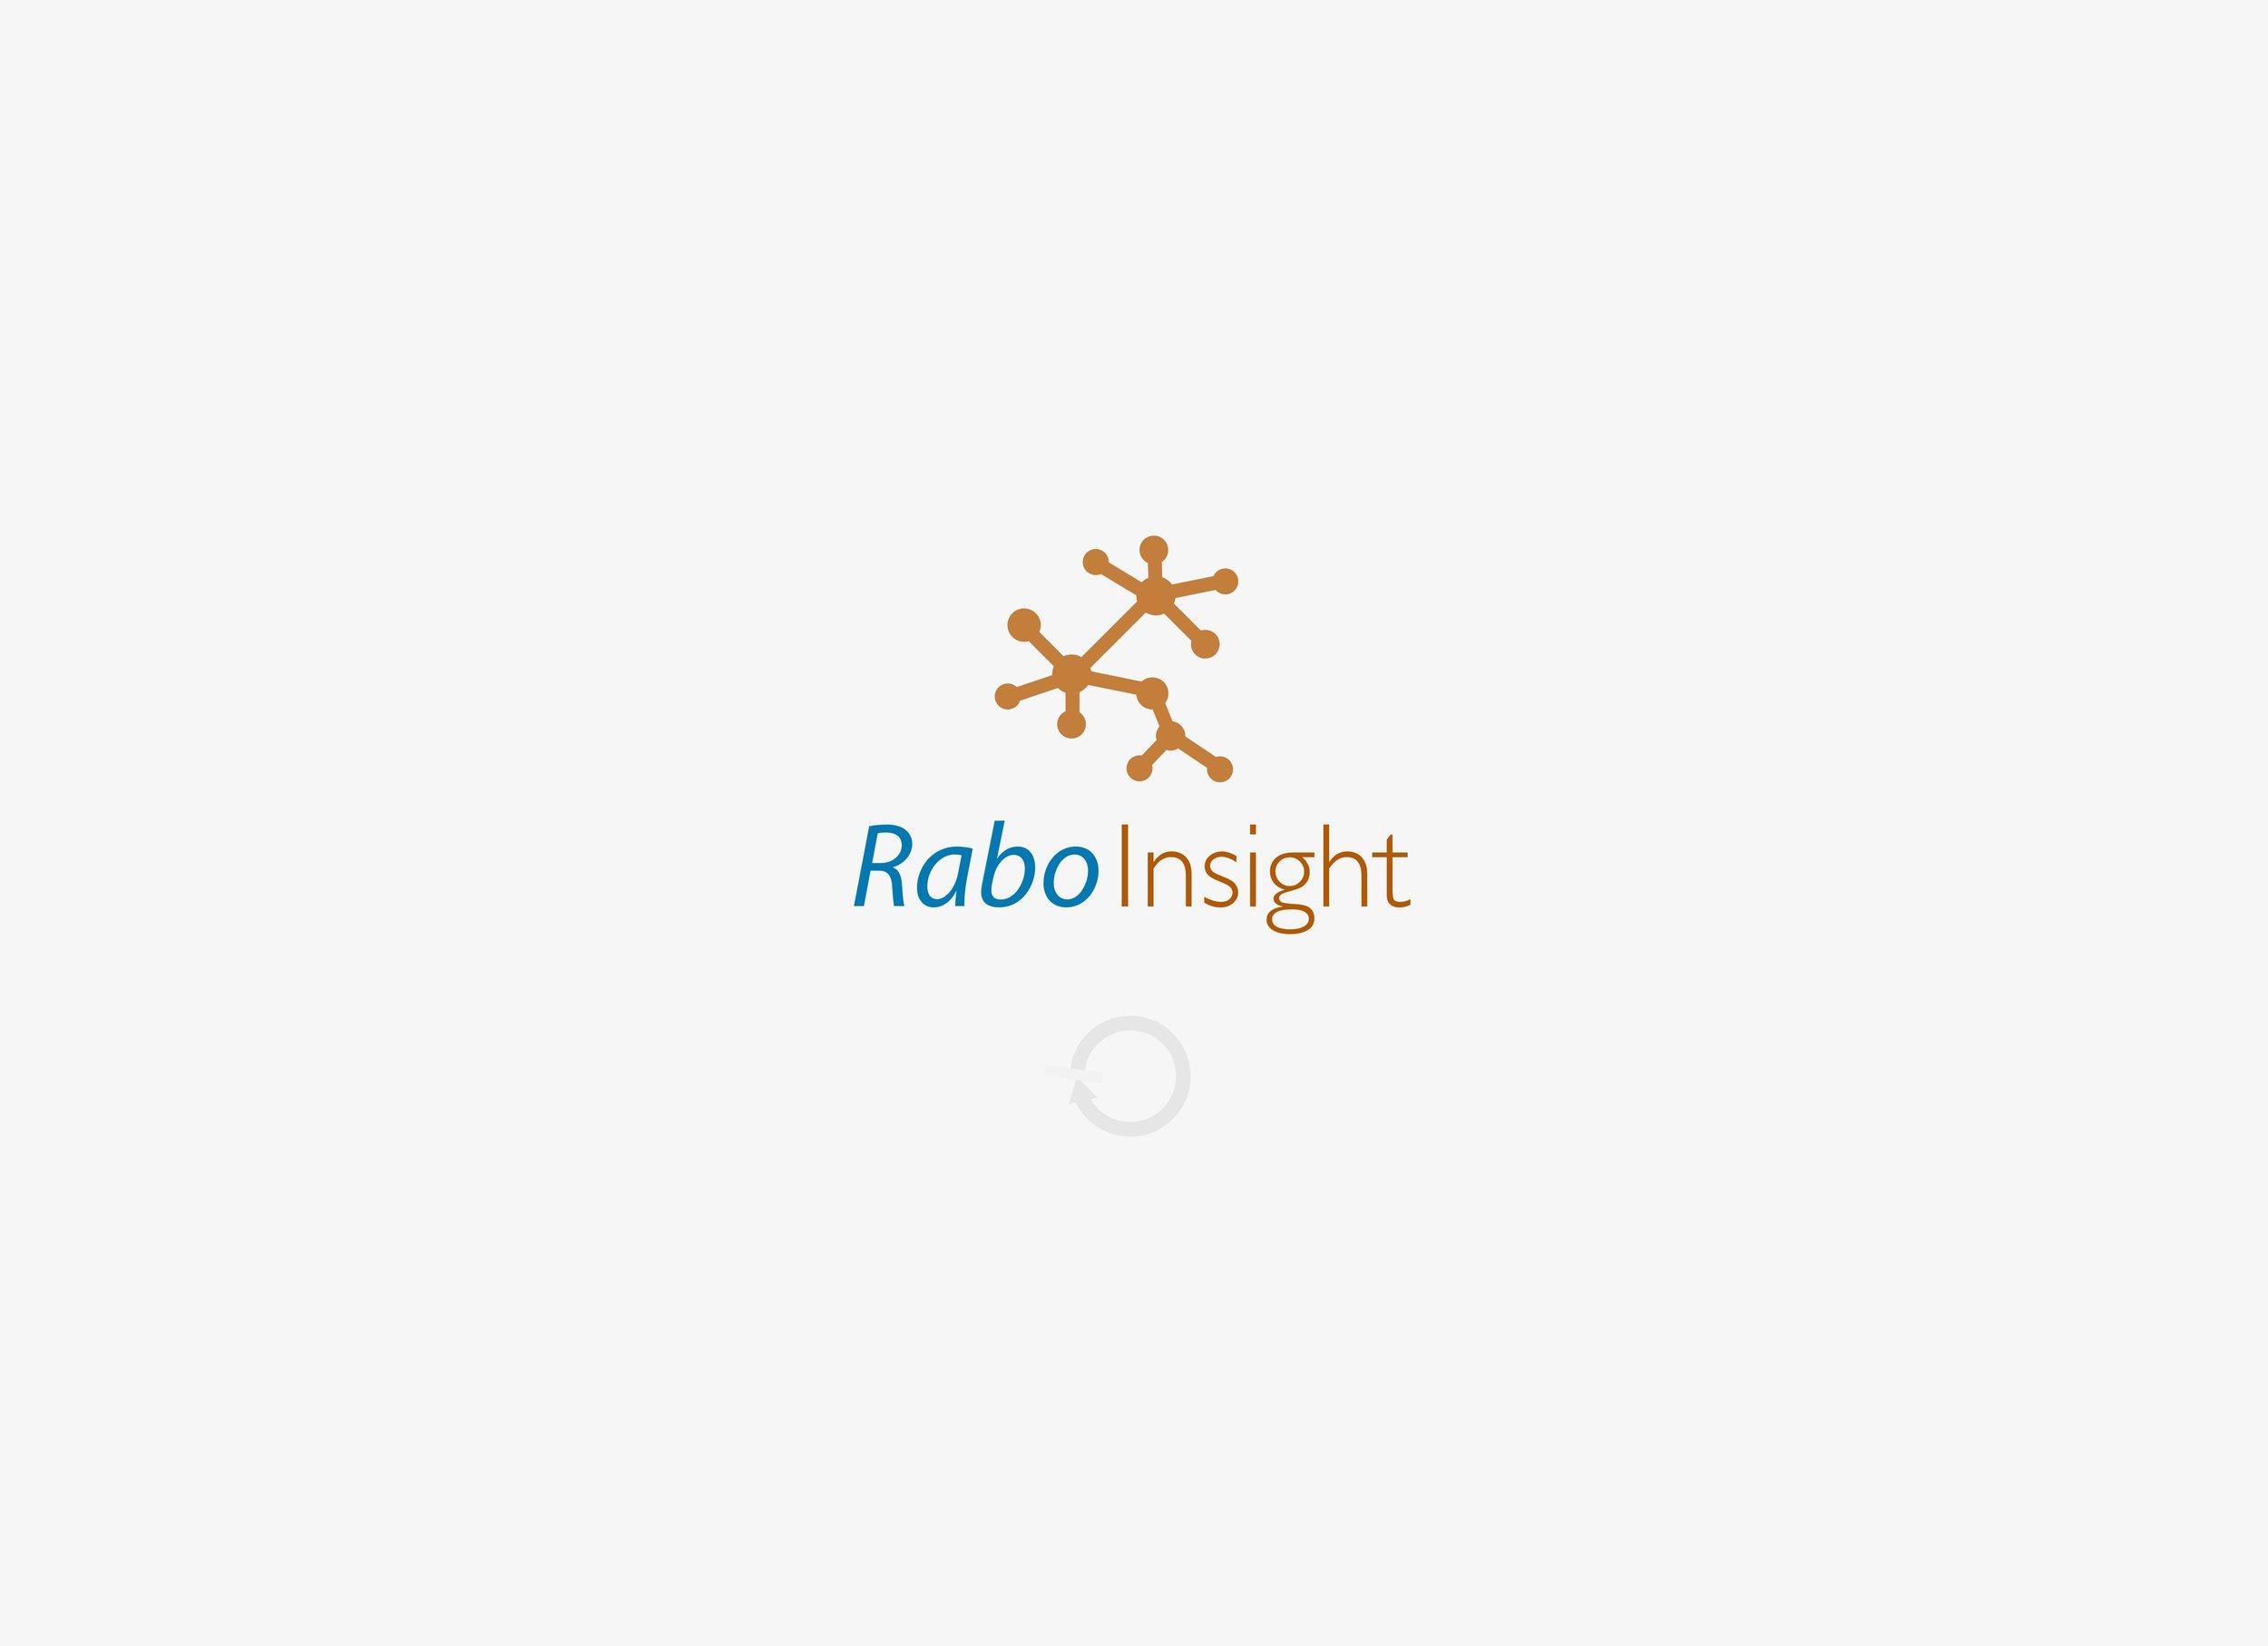 RaboInsight loading screen.